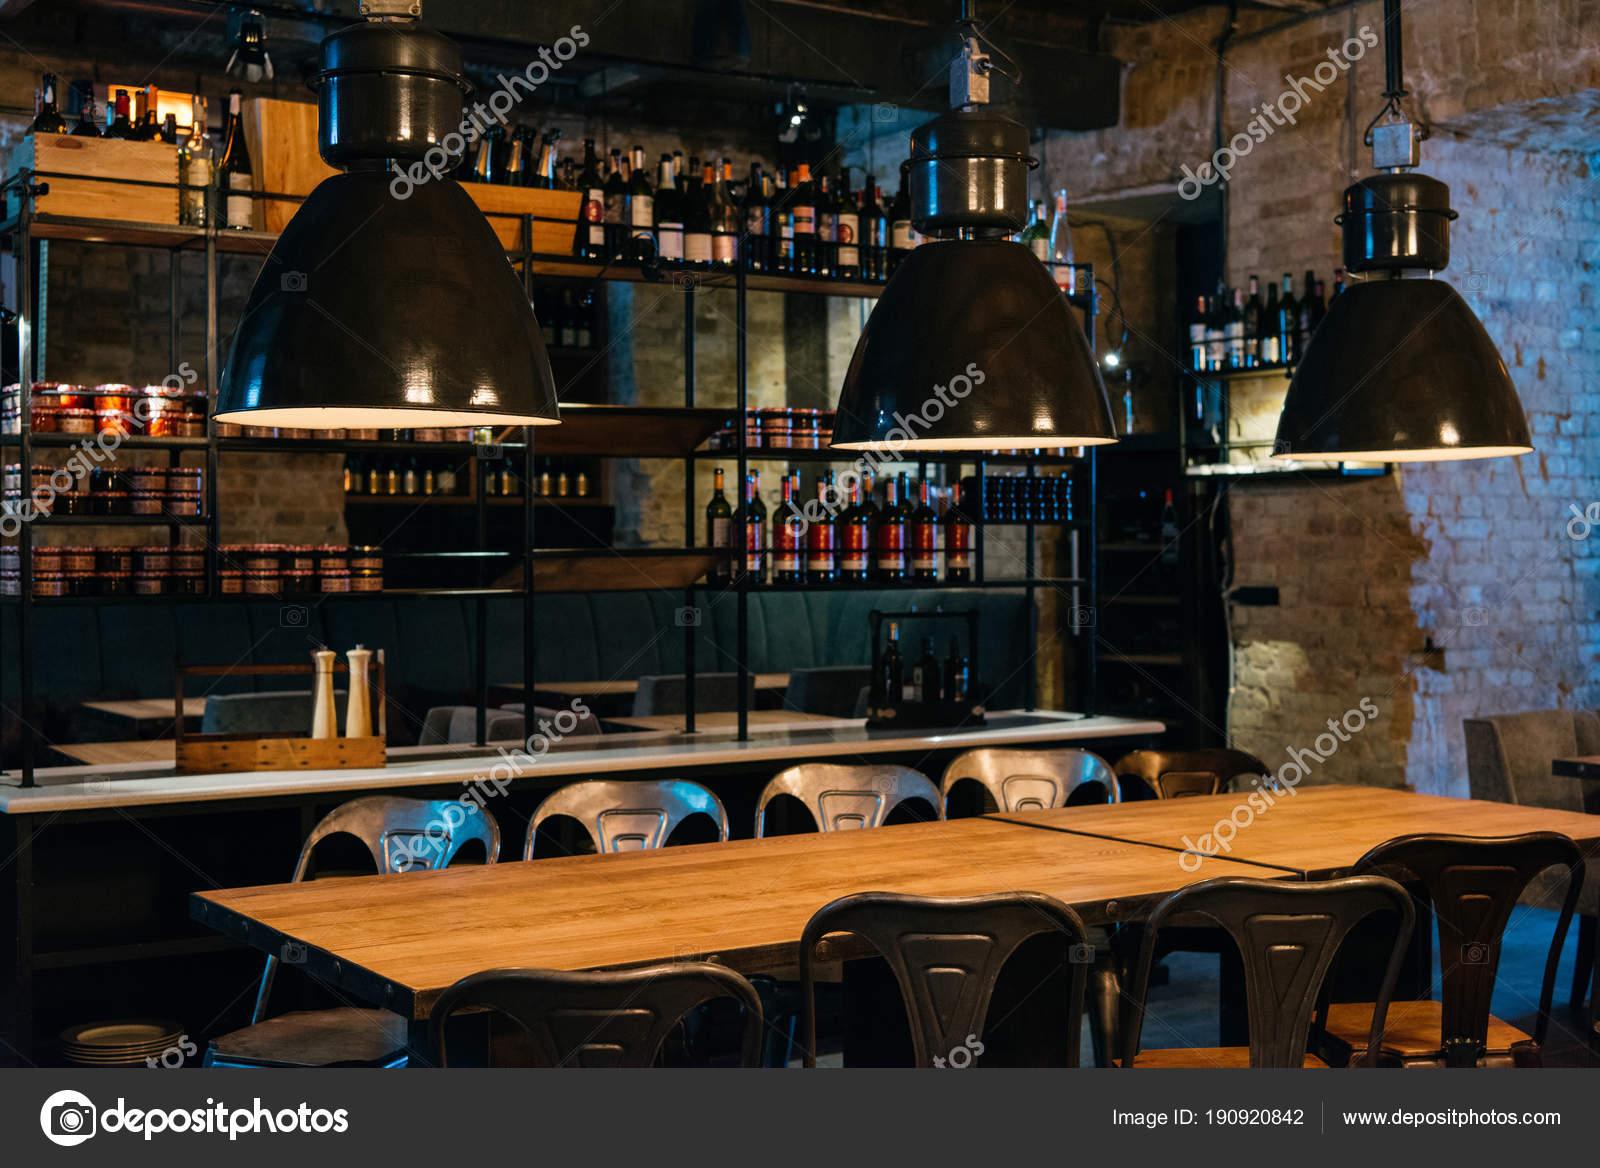 Wooden Tables Lamps Bar Counter Modern Restaurant Stock Photo